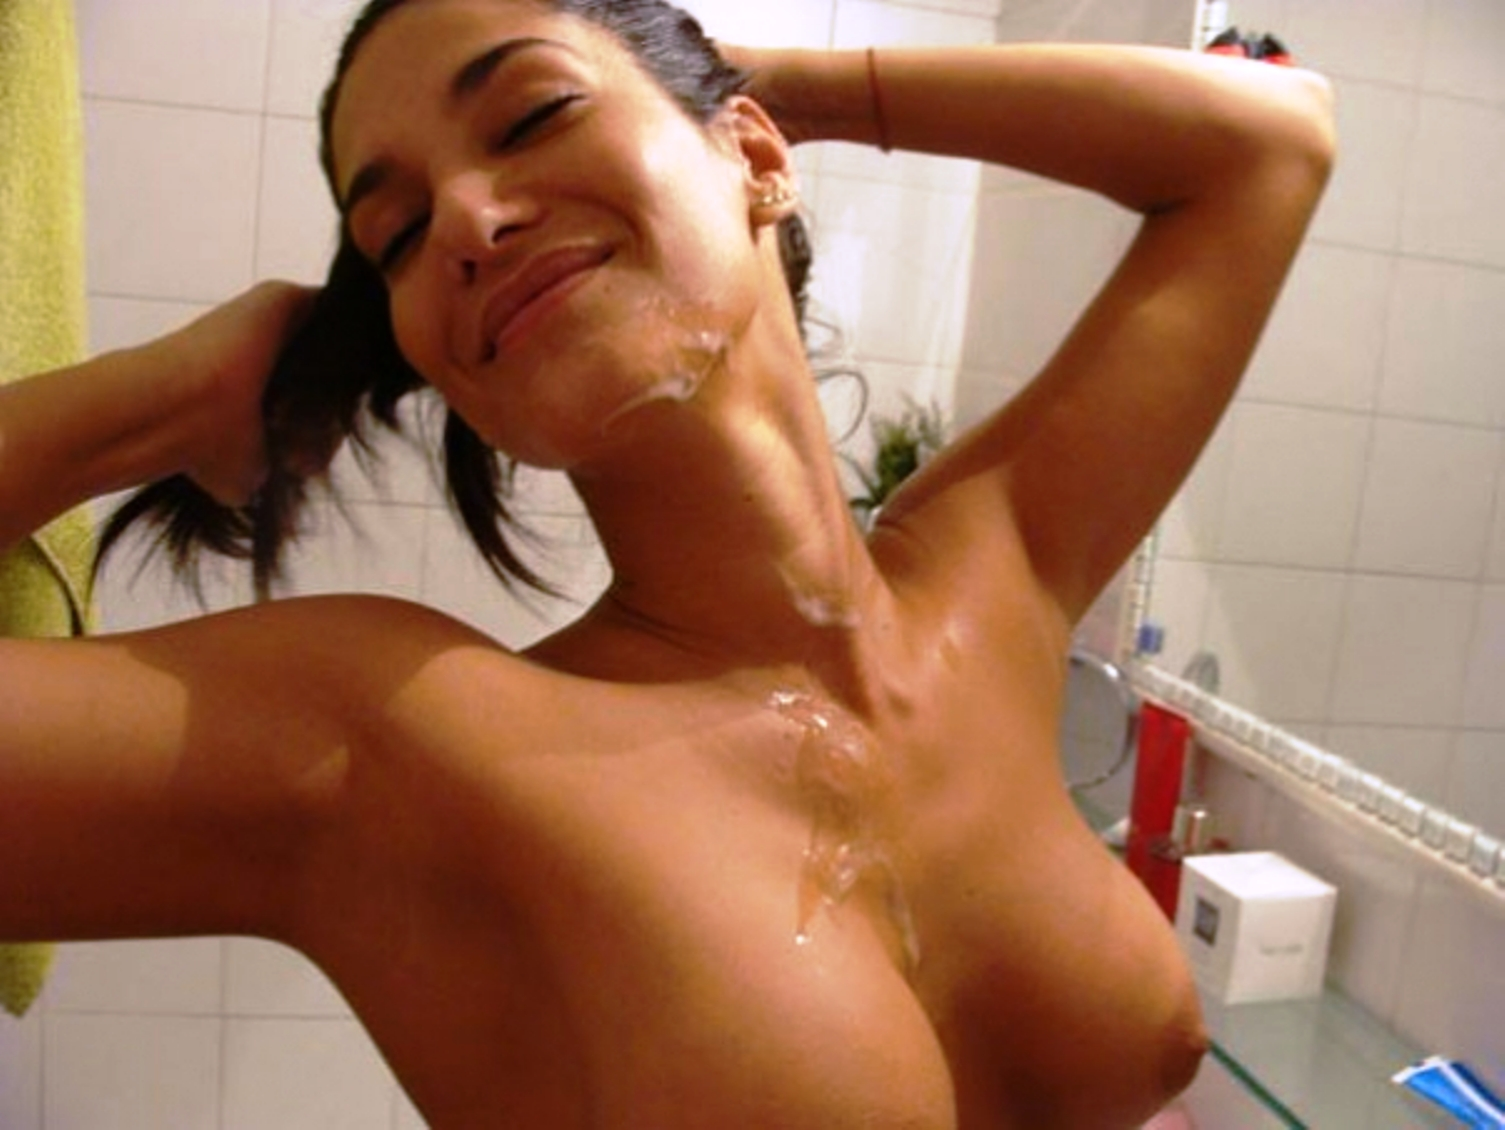 Argentinas Porno Famosas topless argentinas famosas silvina escudero con semen en